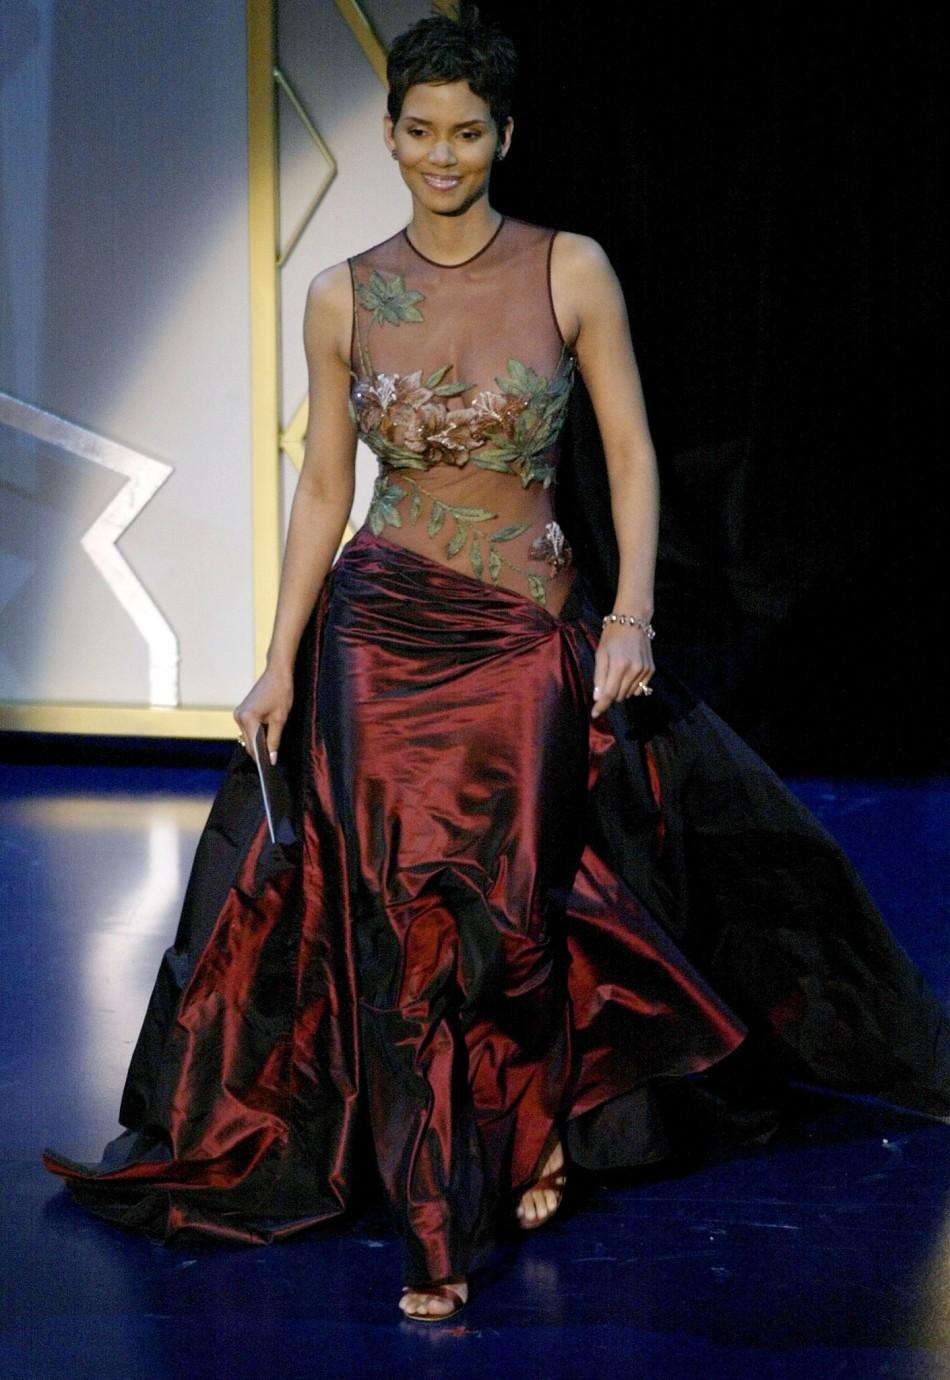 Oscars 2013 10 Best Dressed Celebrities At Red Carpet